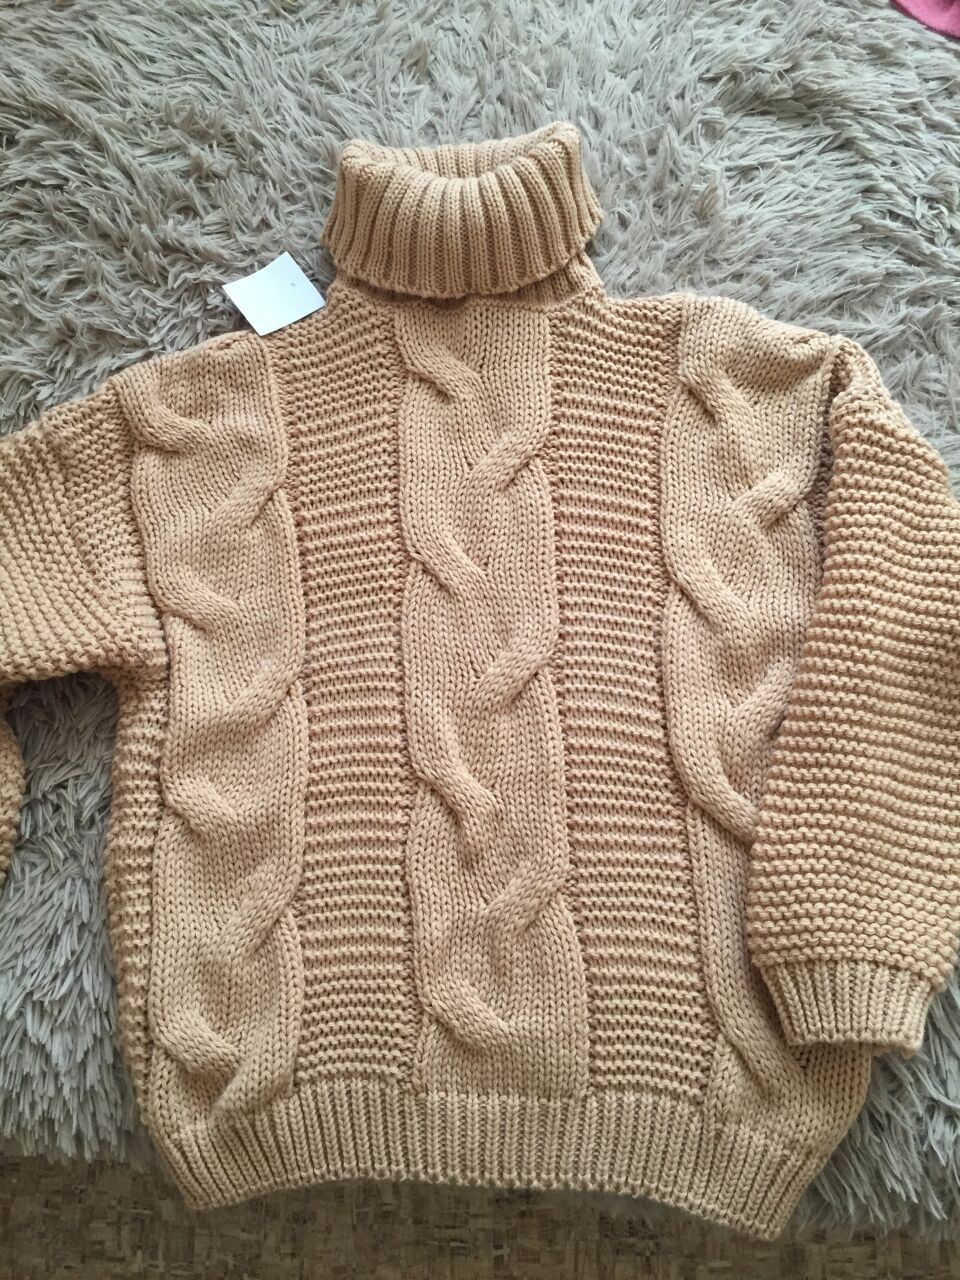 Продам свитер женский - 1500 руб. Одежда 68e460cfc37f4